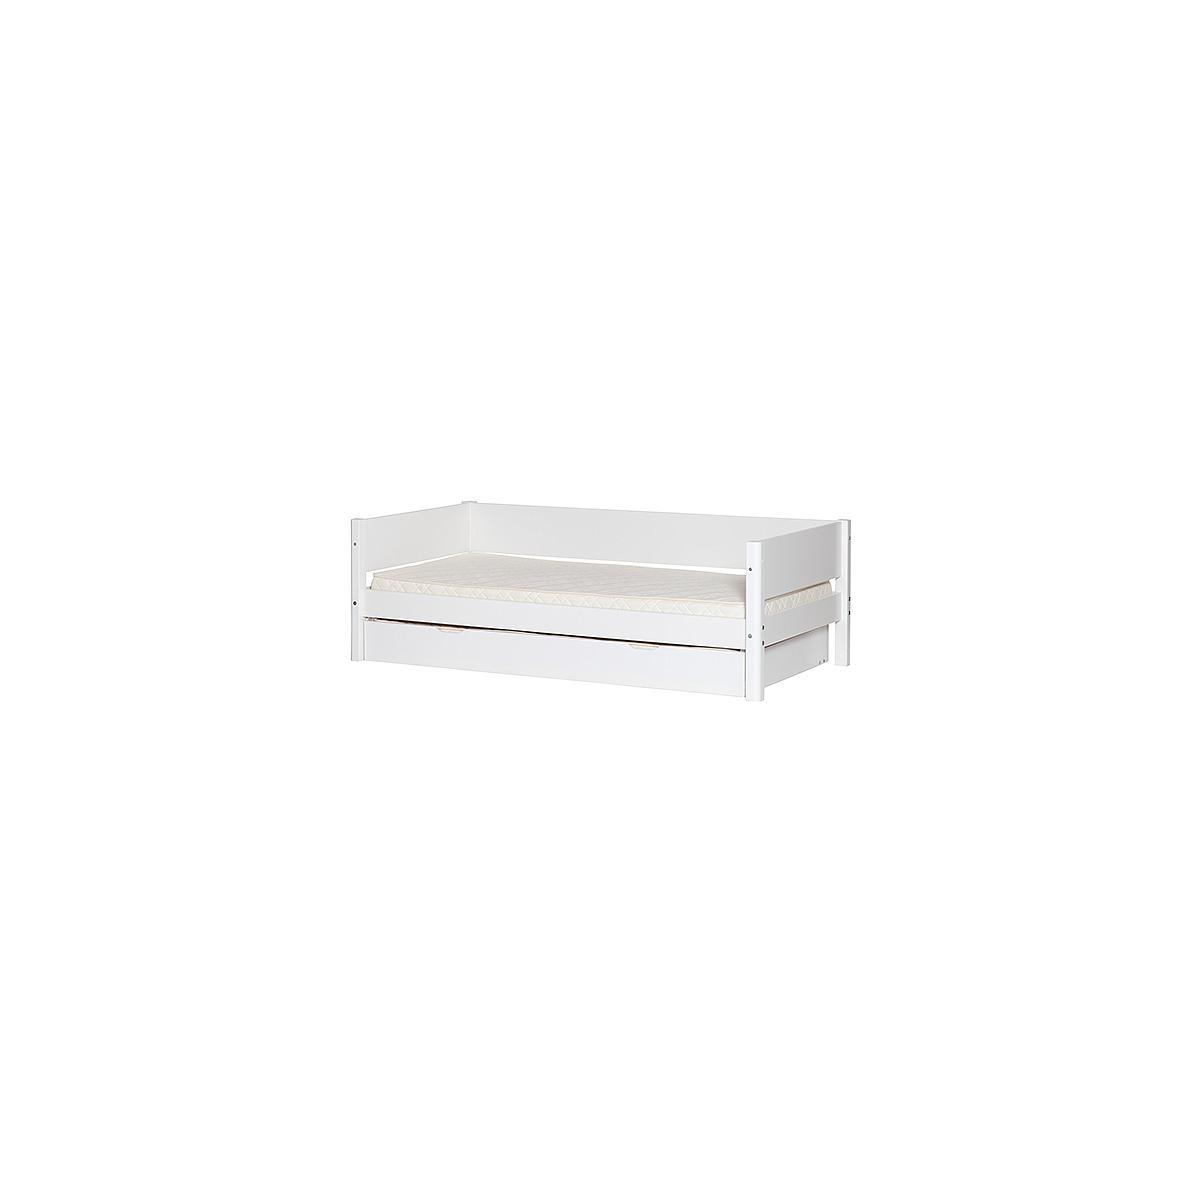 Barrera trasera Cama 90x200 WHITE Flexa blanca